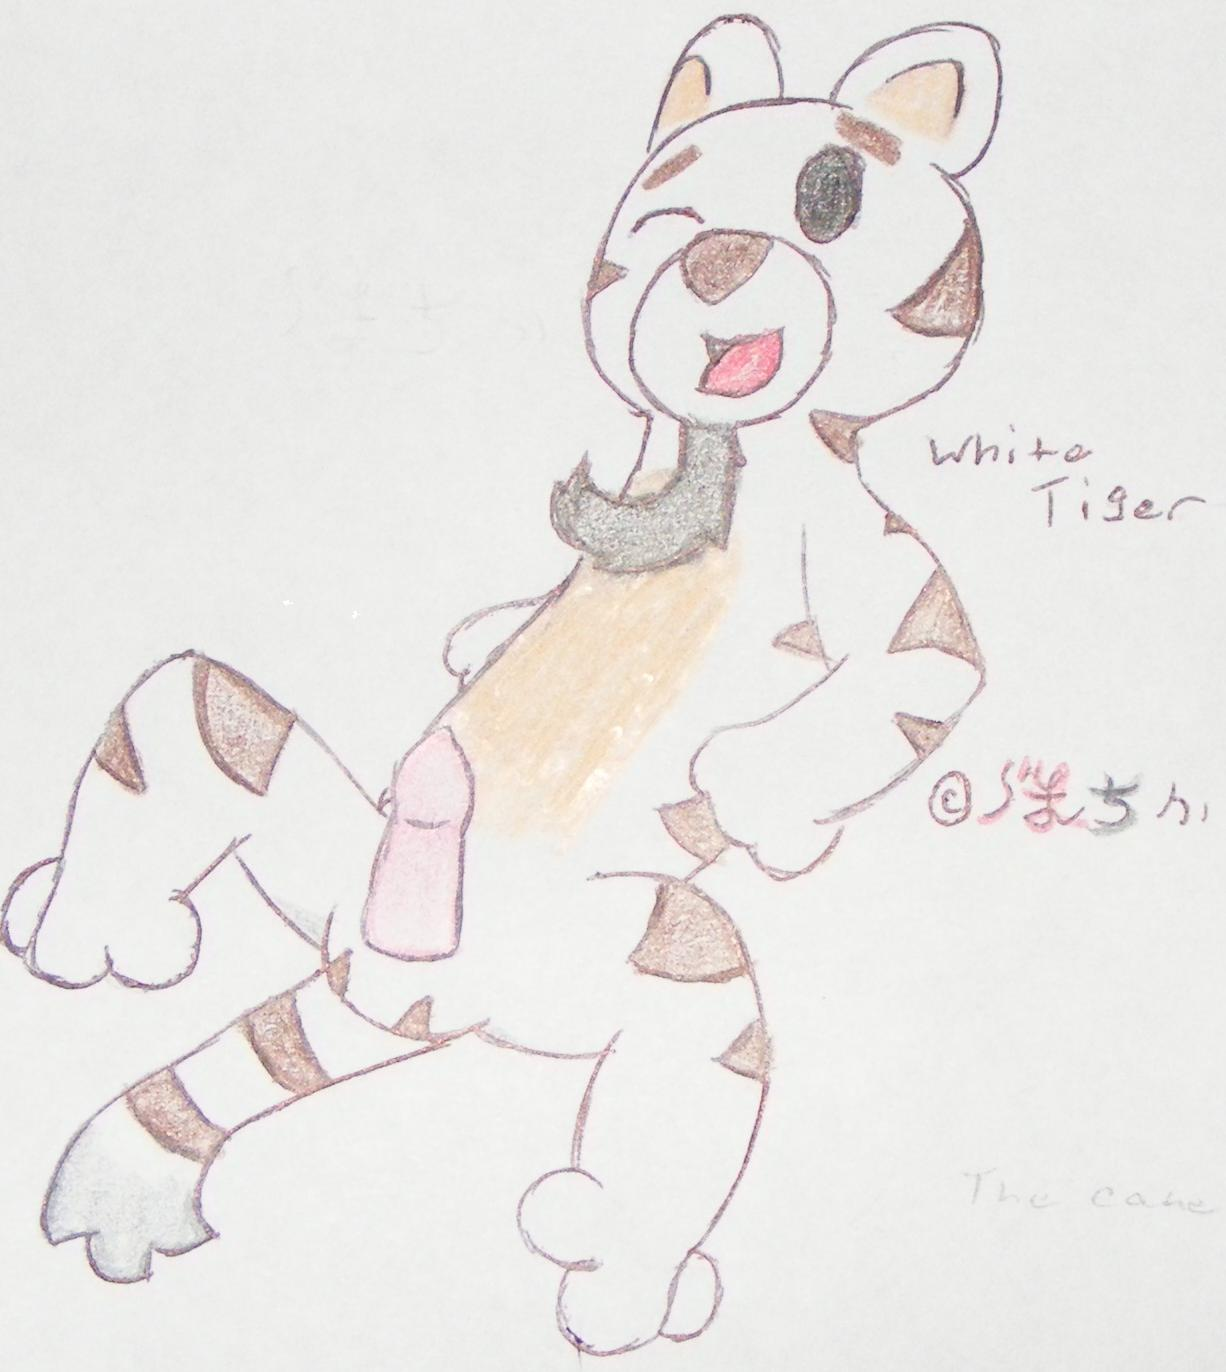 w mask miss x tiger Sekiro o'rin of the water